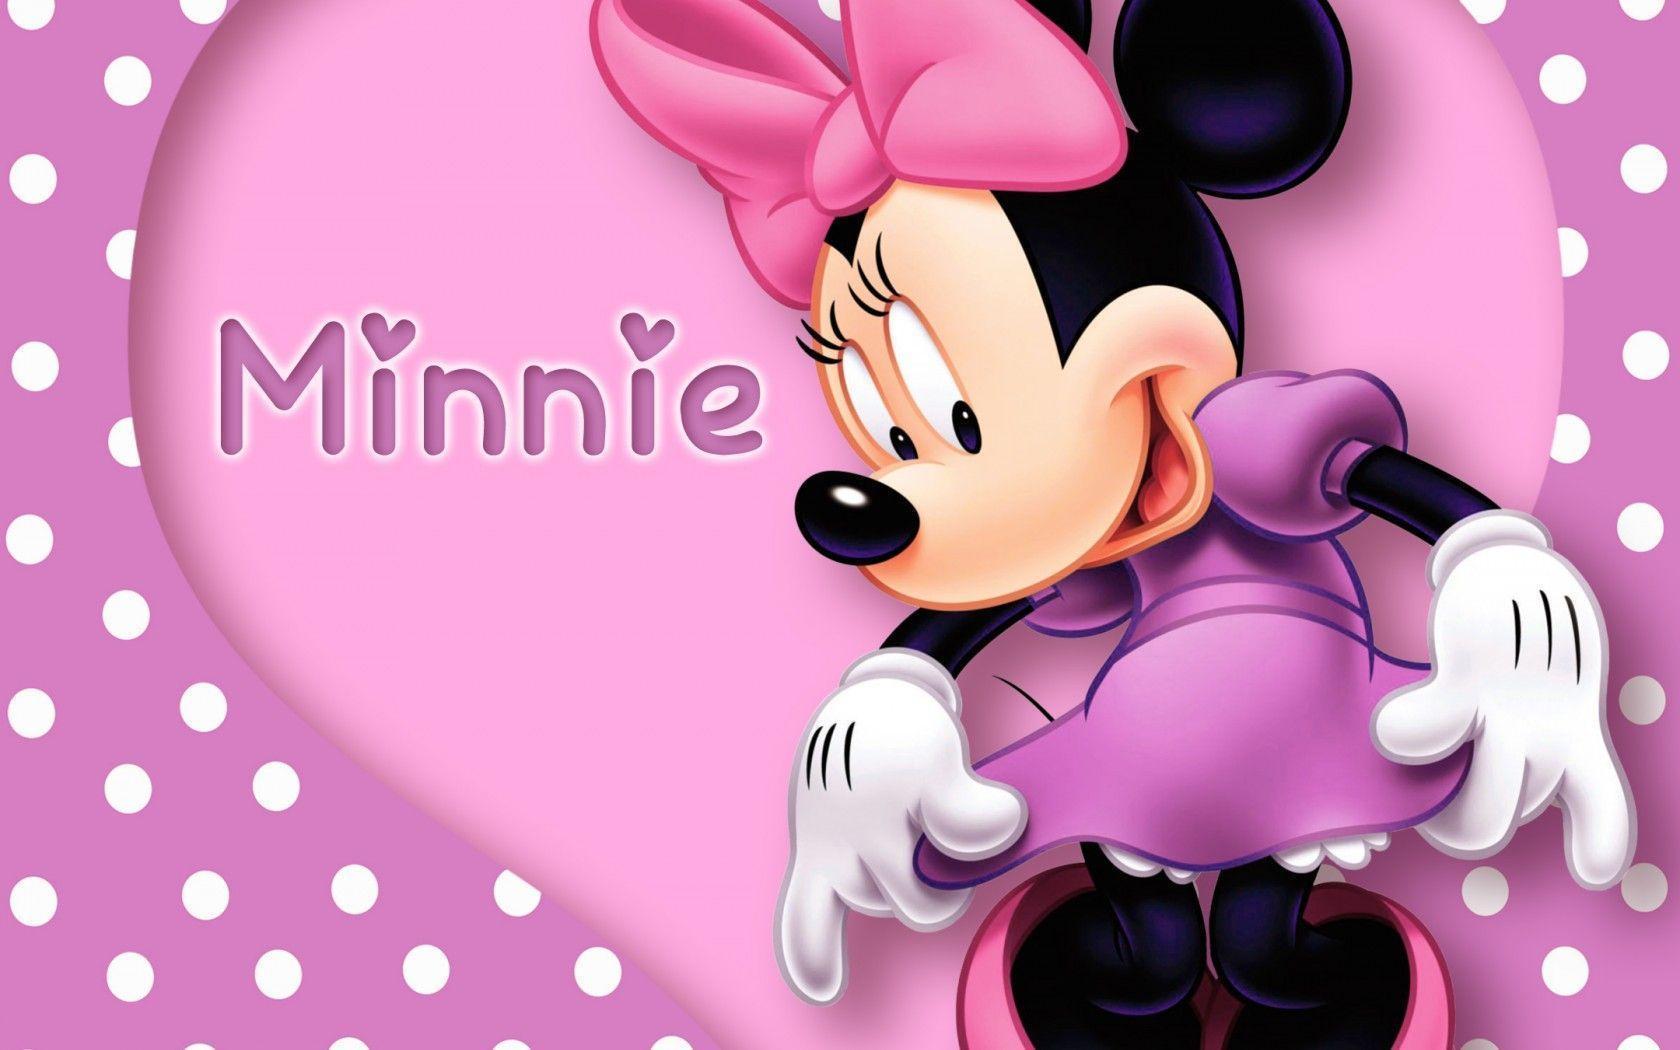 outstanding minnie wallpaper mickey - photo #27